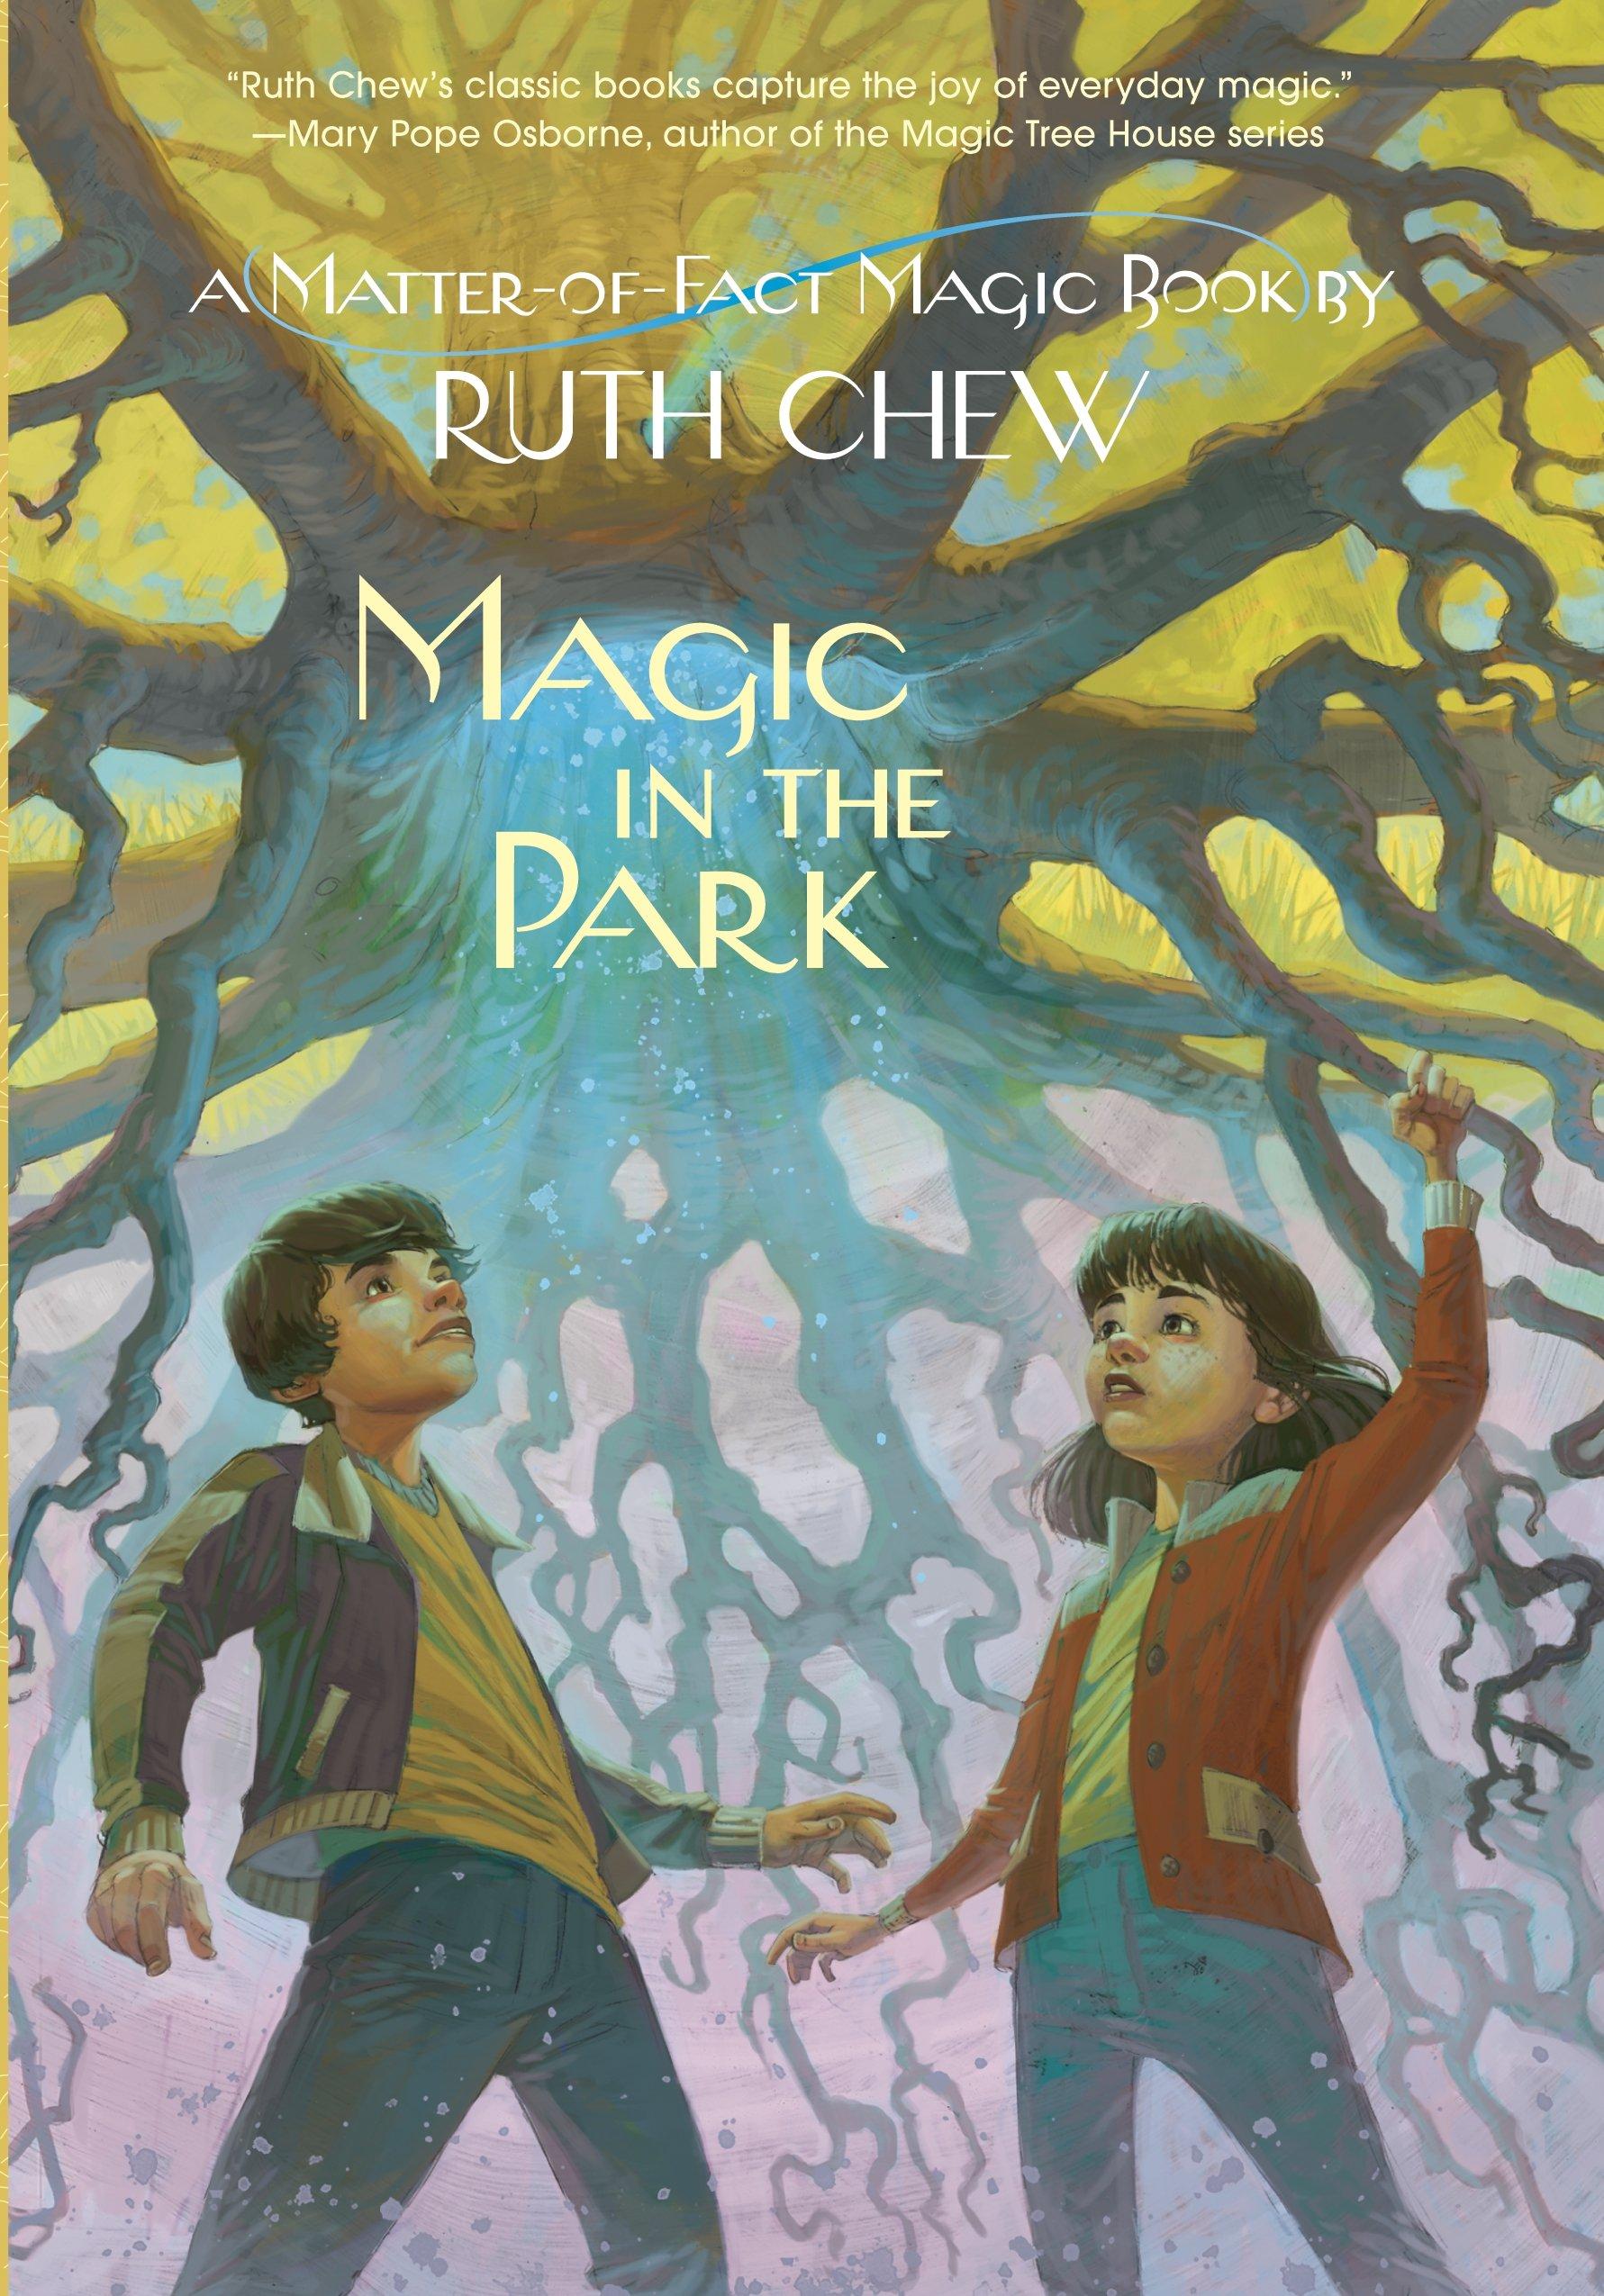 A Matter-of-Fact Magic Book: Magic in the Park pdf